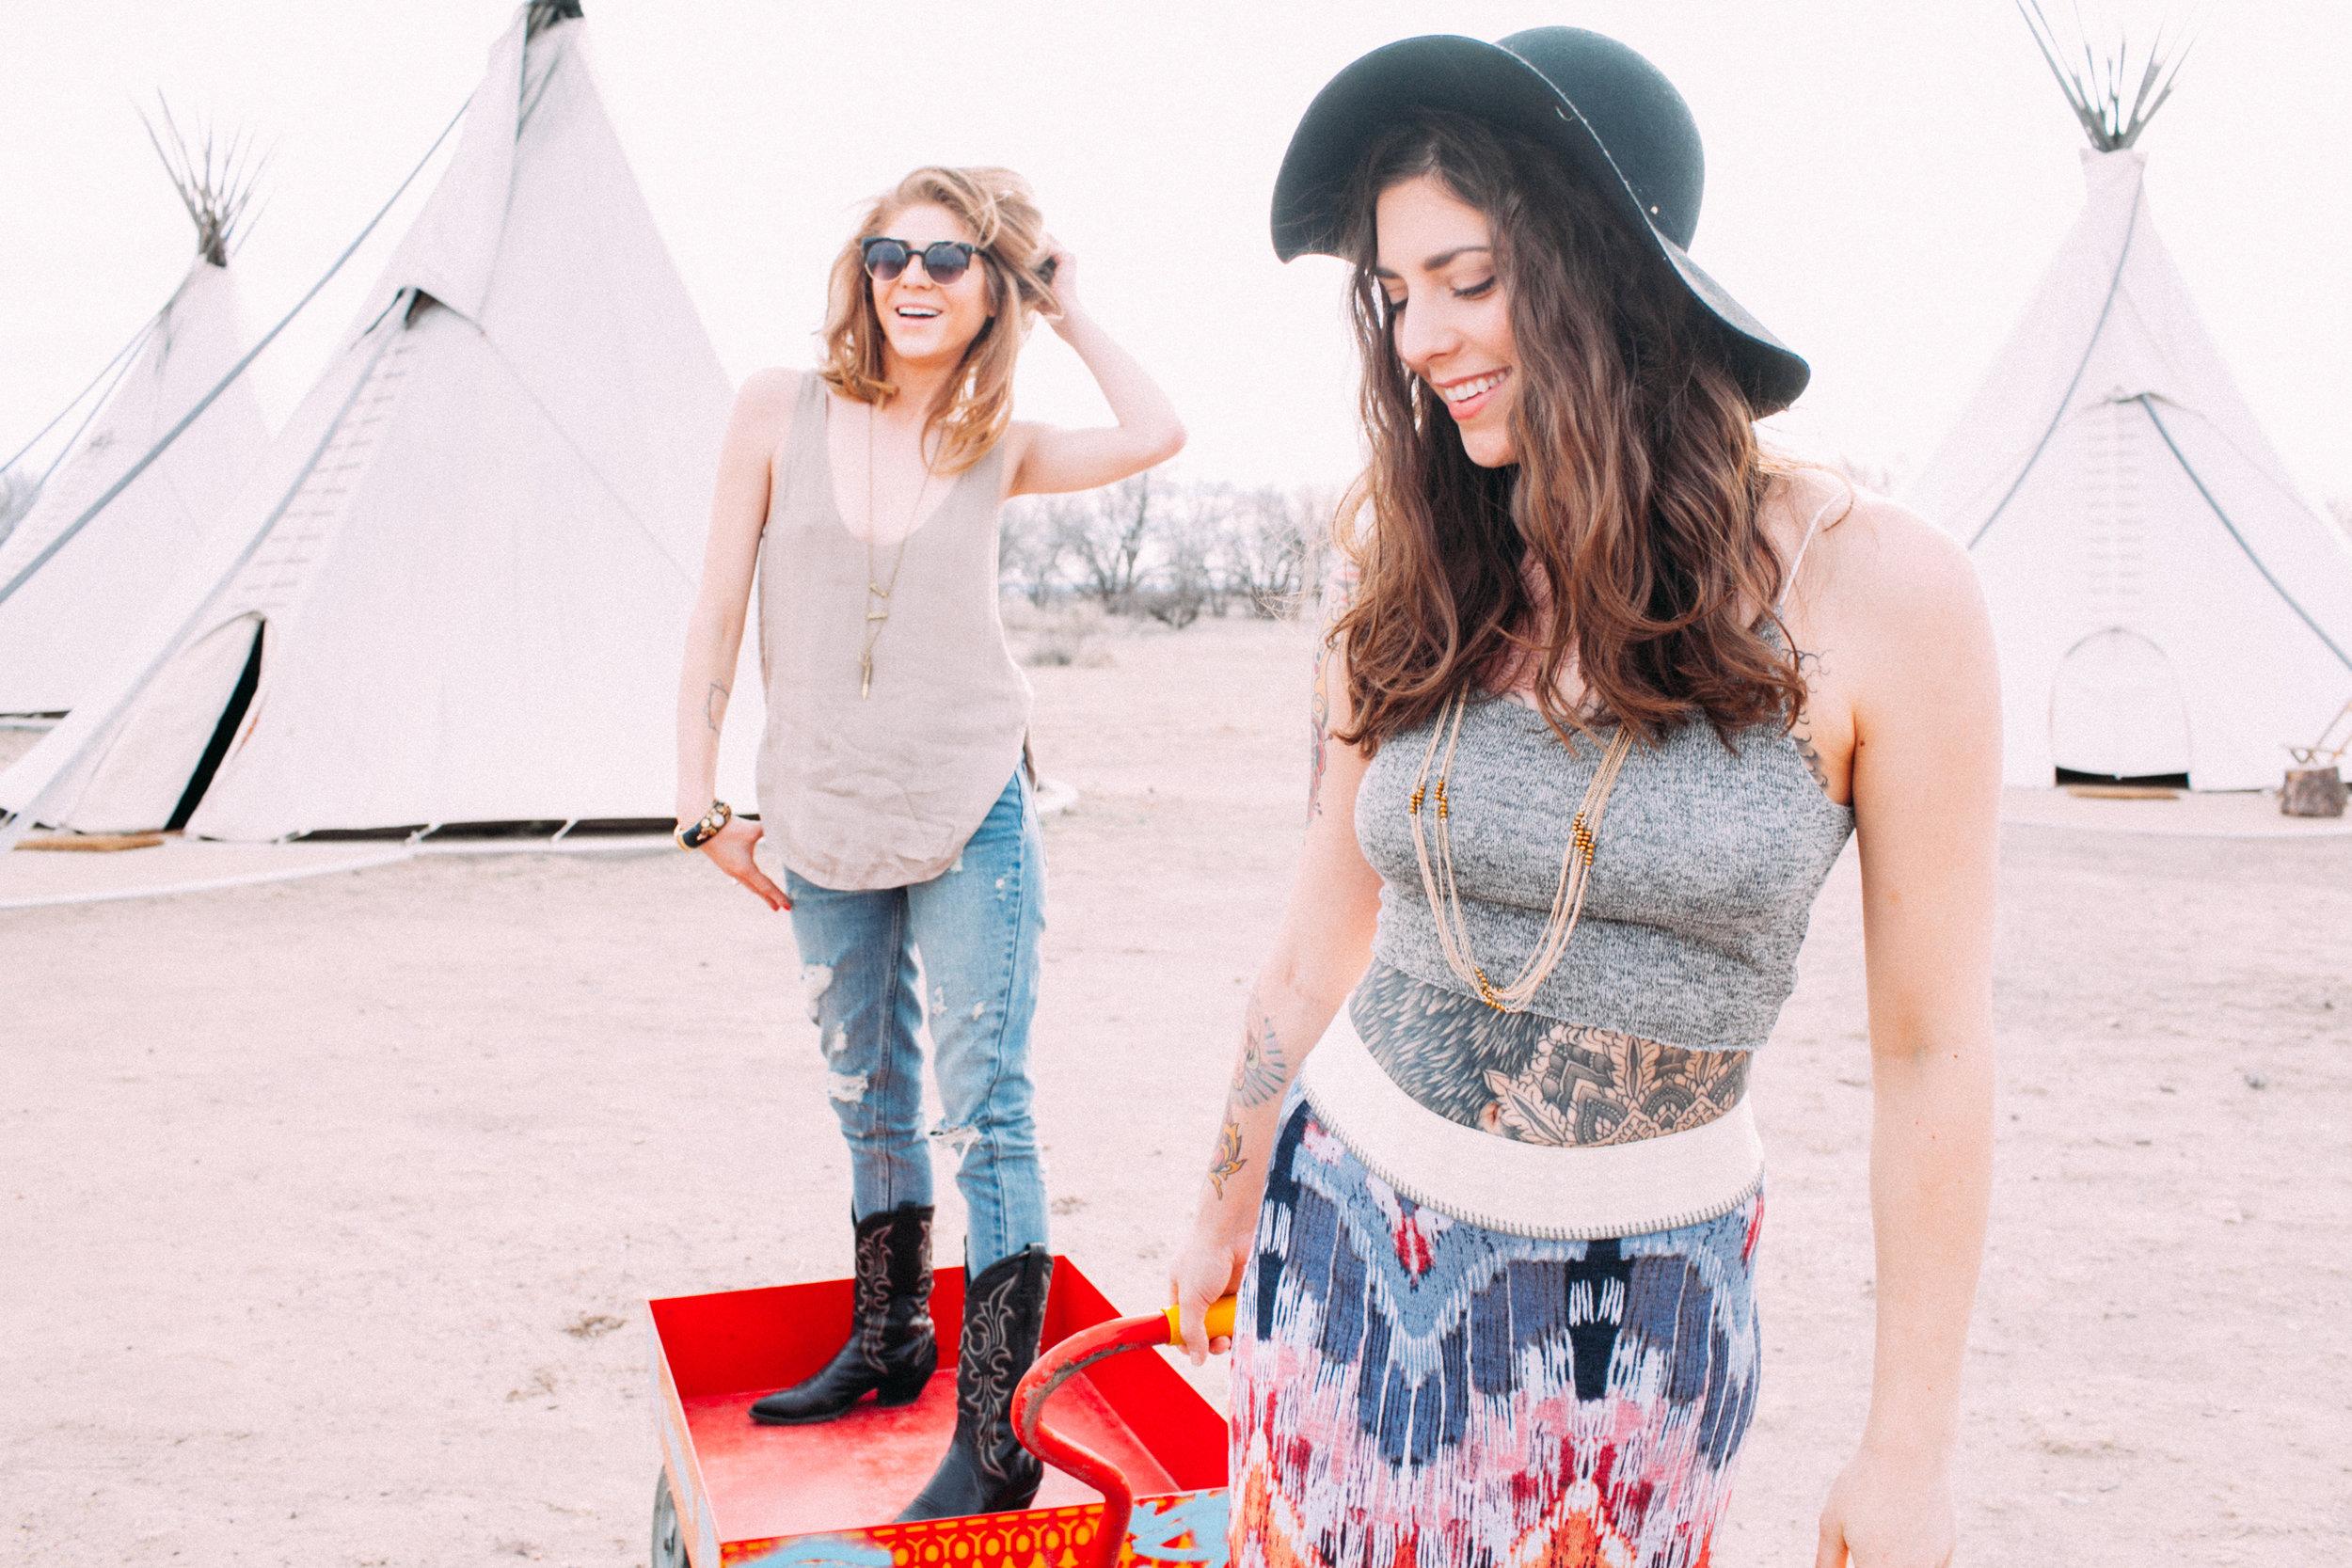 Marfa Texas Day 1 Chloe and Ashley 2015-60.jpg